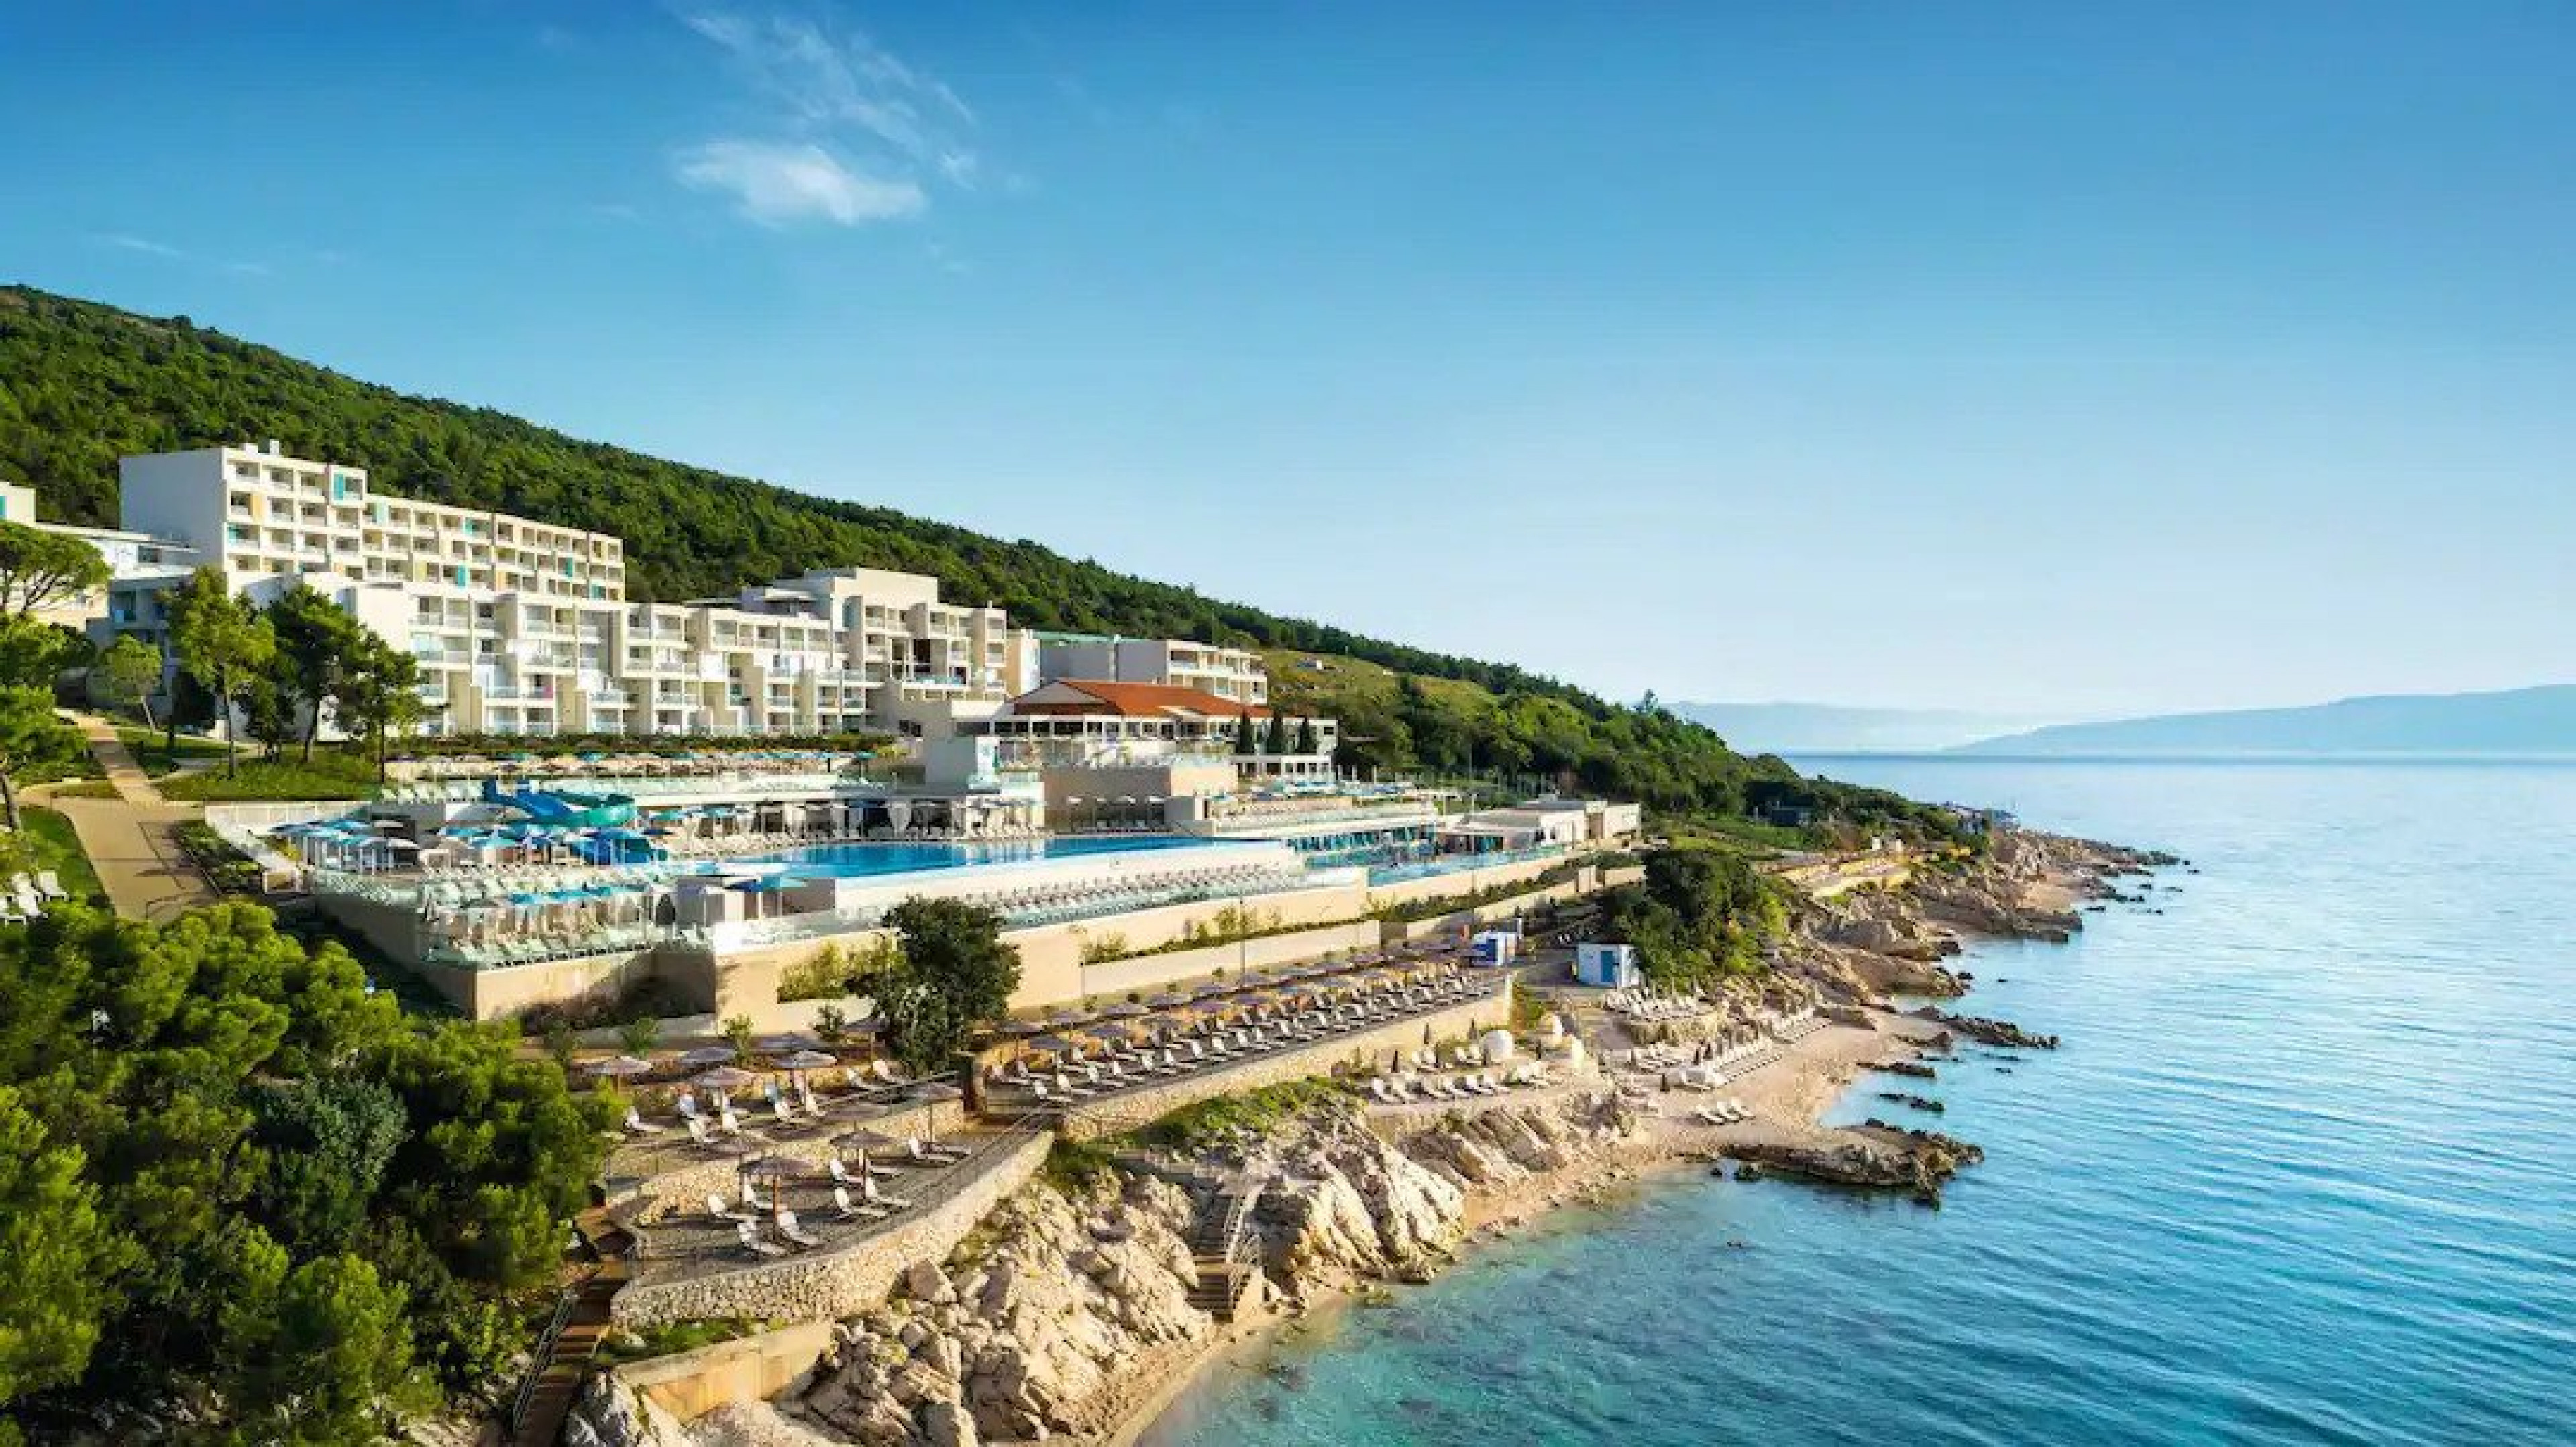 7 Nights All Inclusive Croatia for £541pp